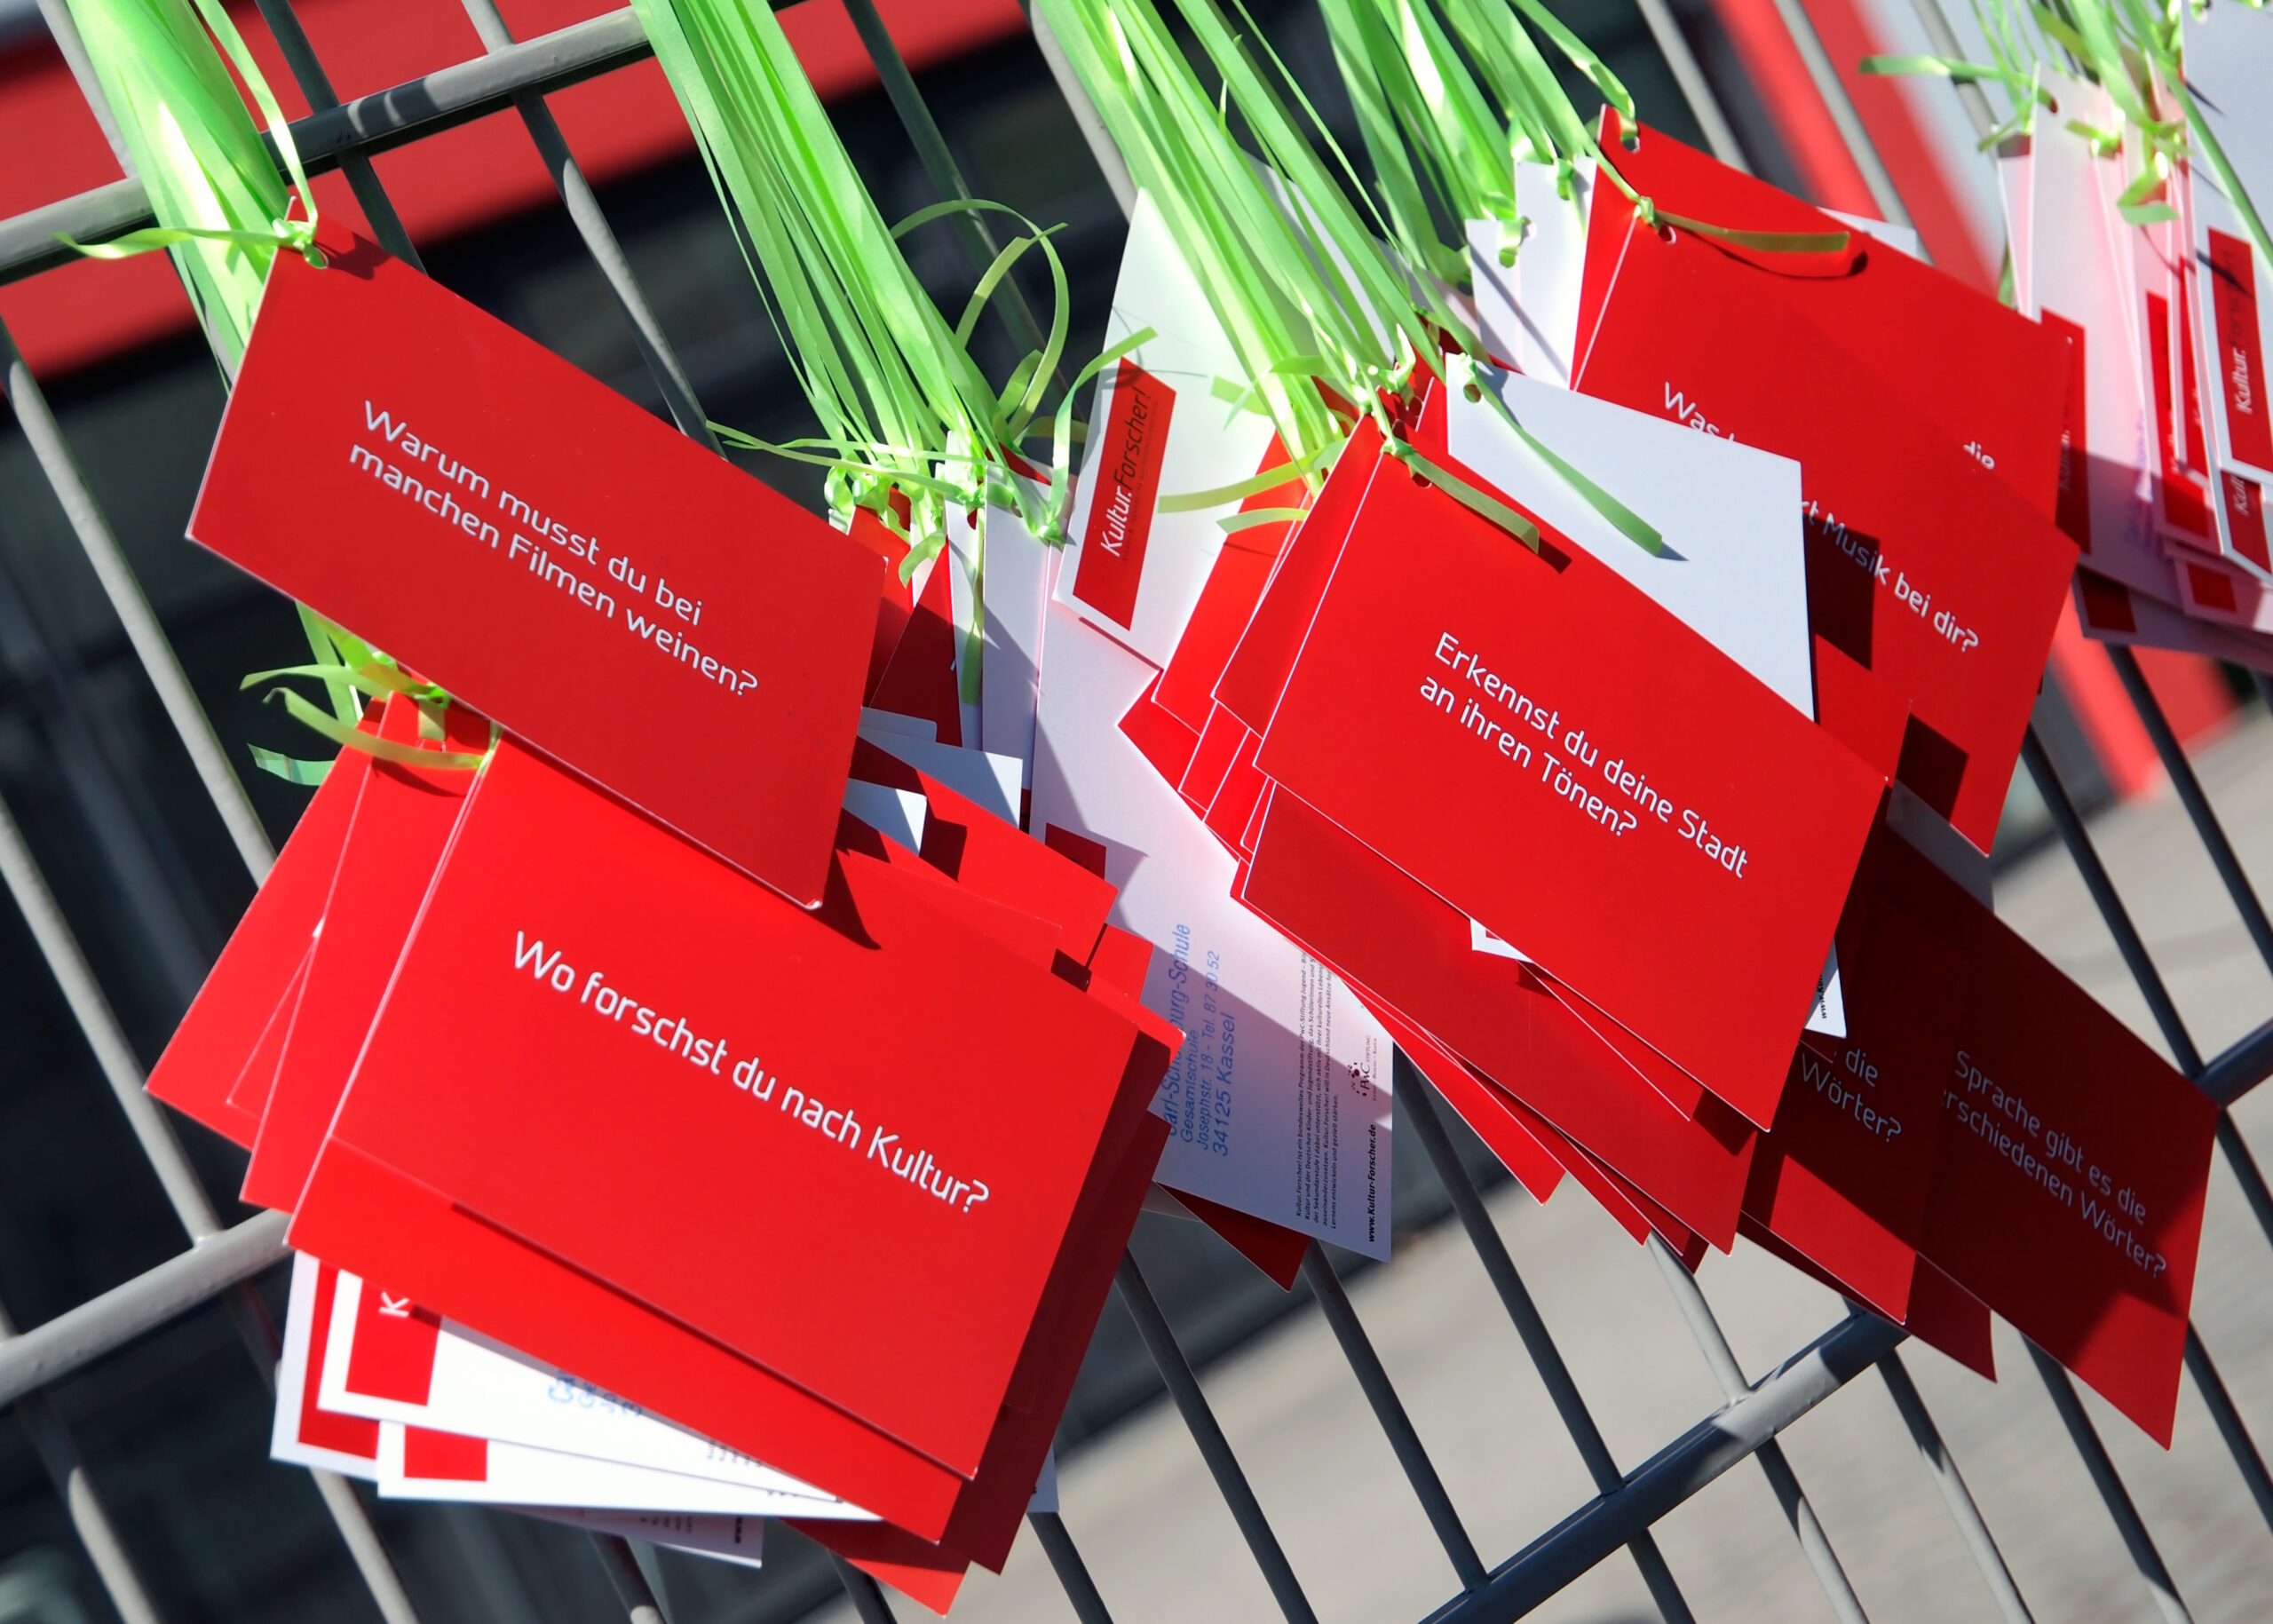 01_Programm_ueber das Programm_Postkarten_Credits_DKJS Archiv PwC-Stiftung